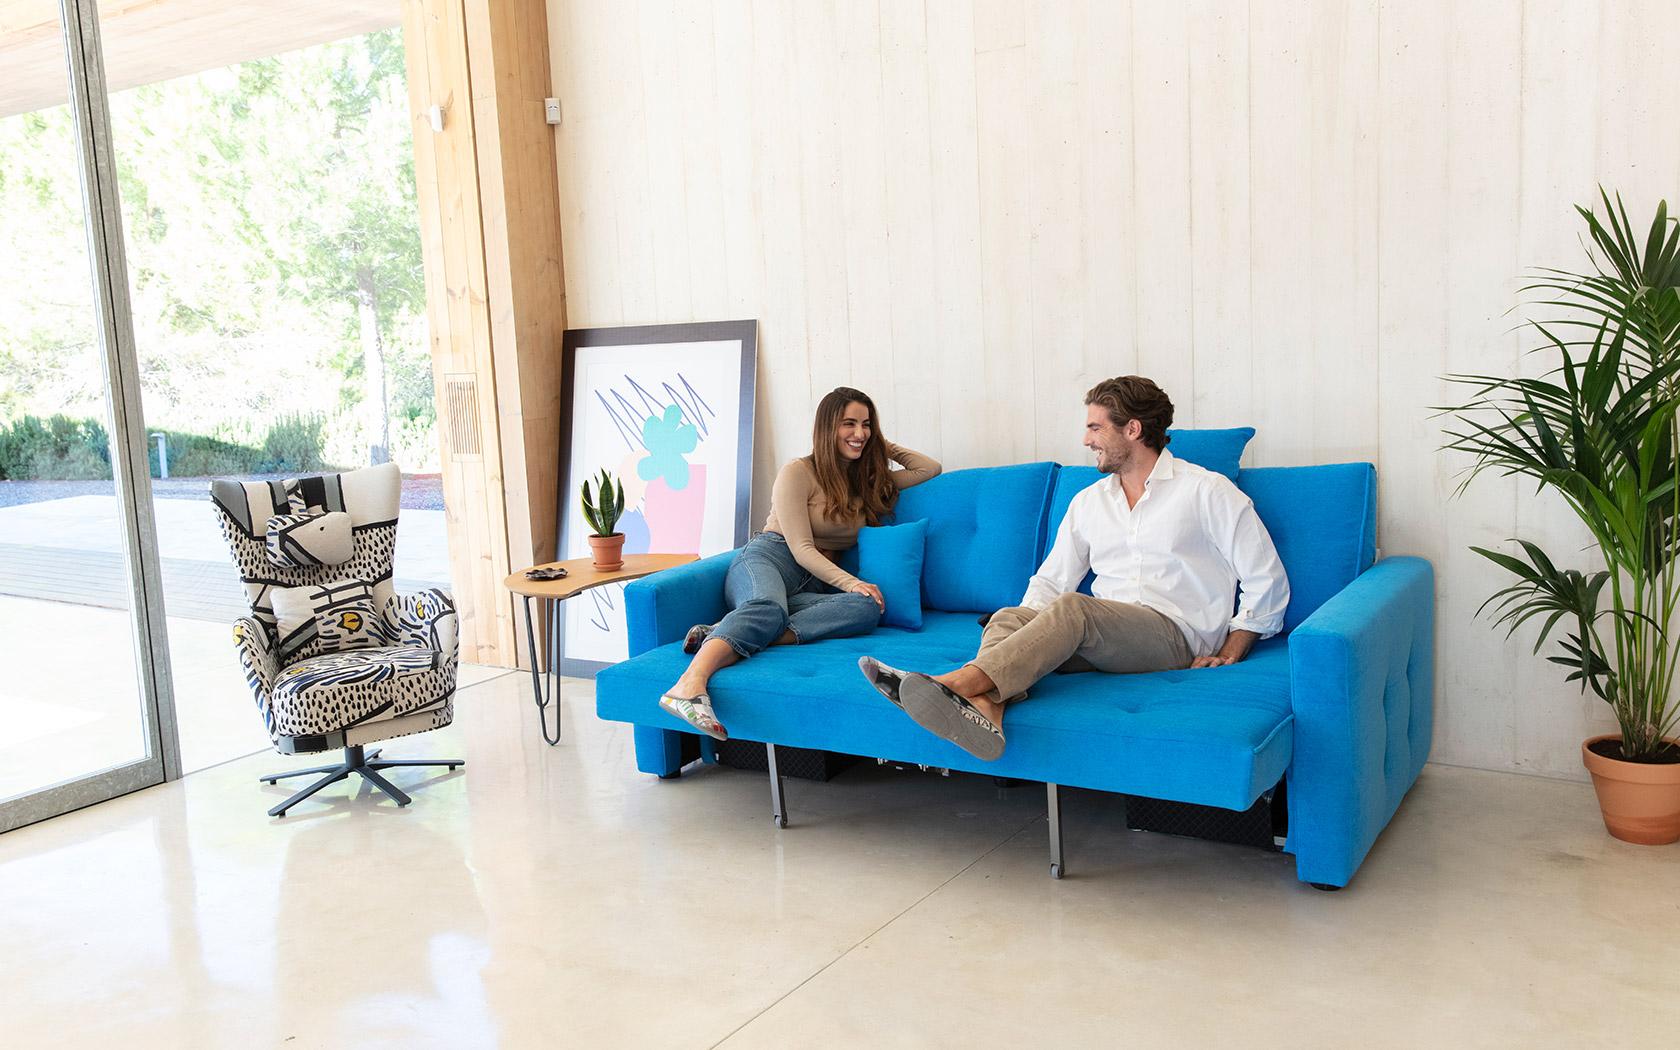 indy sofa 2021 baja 04